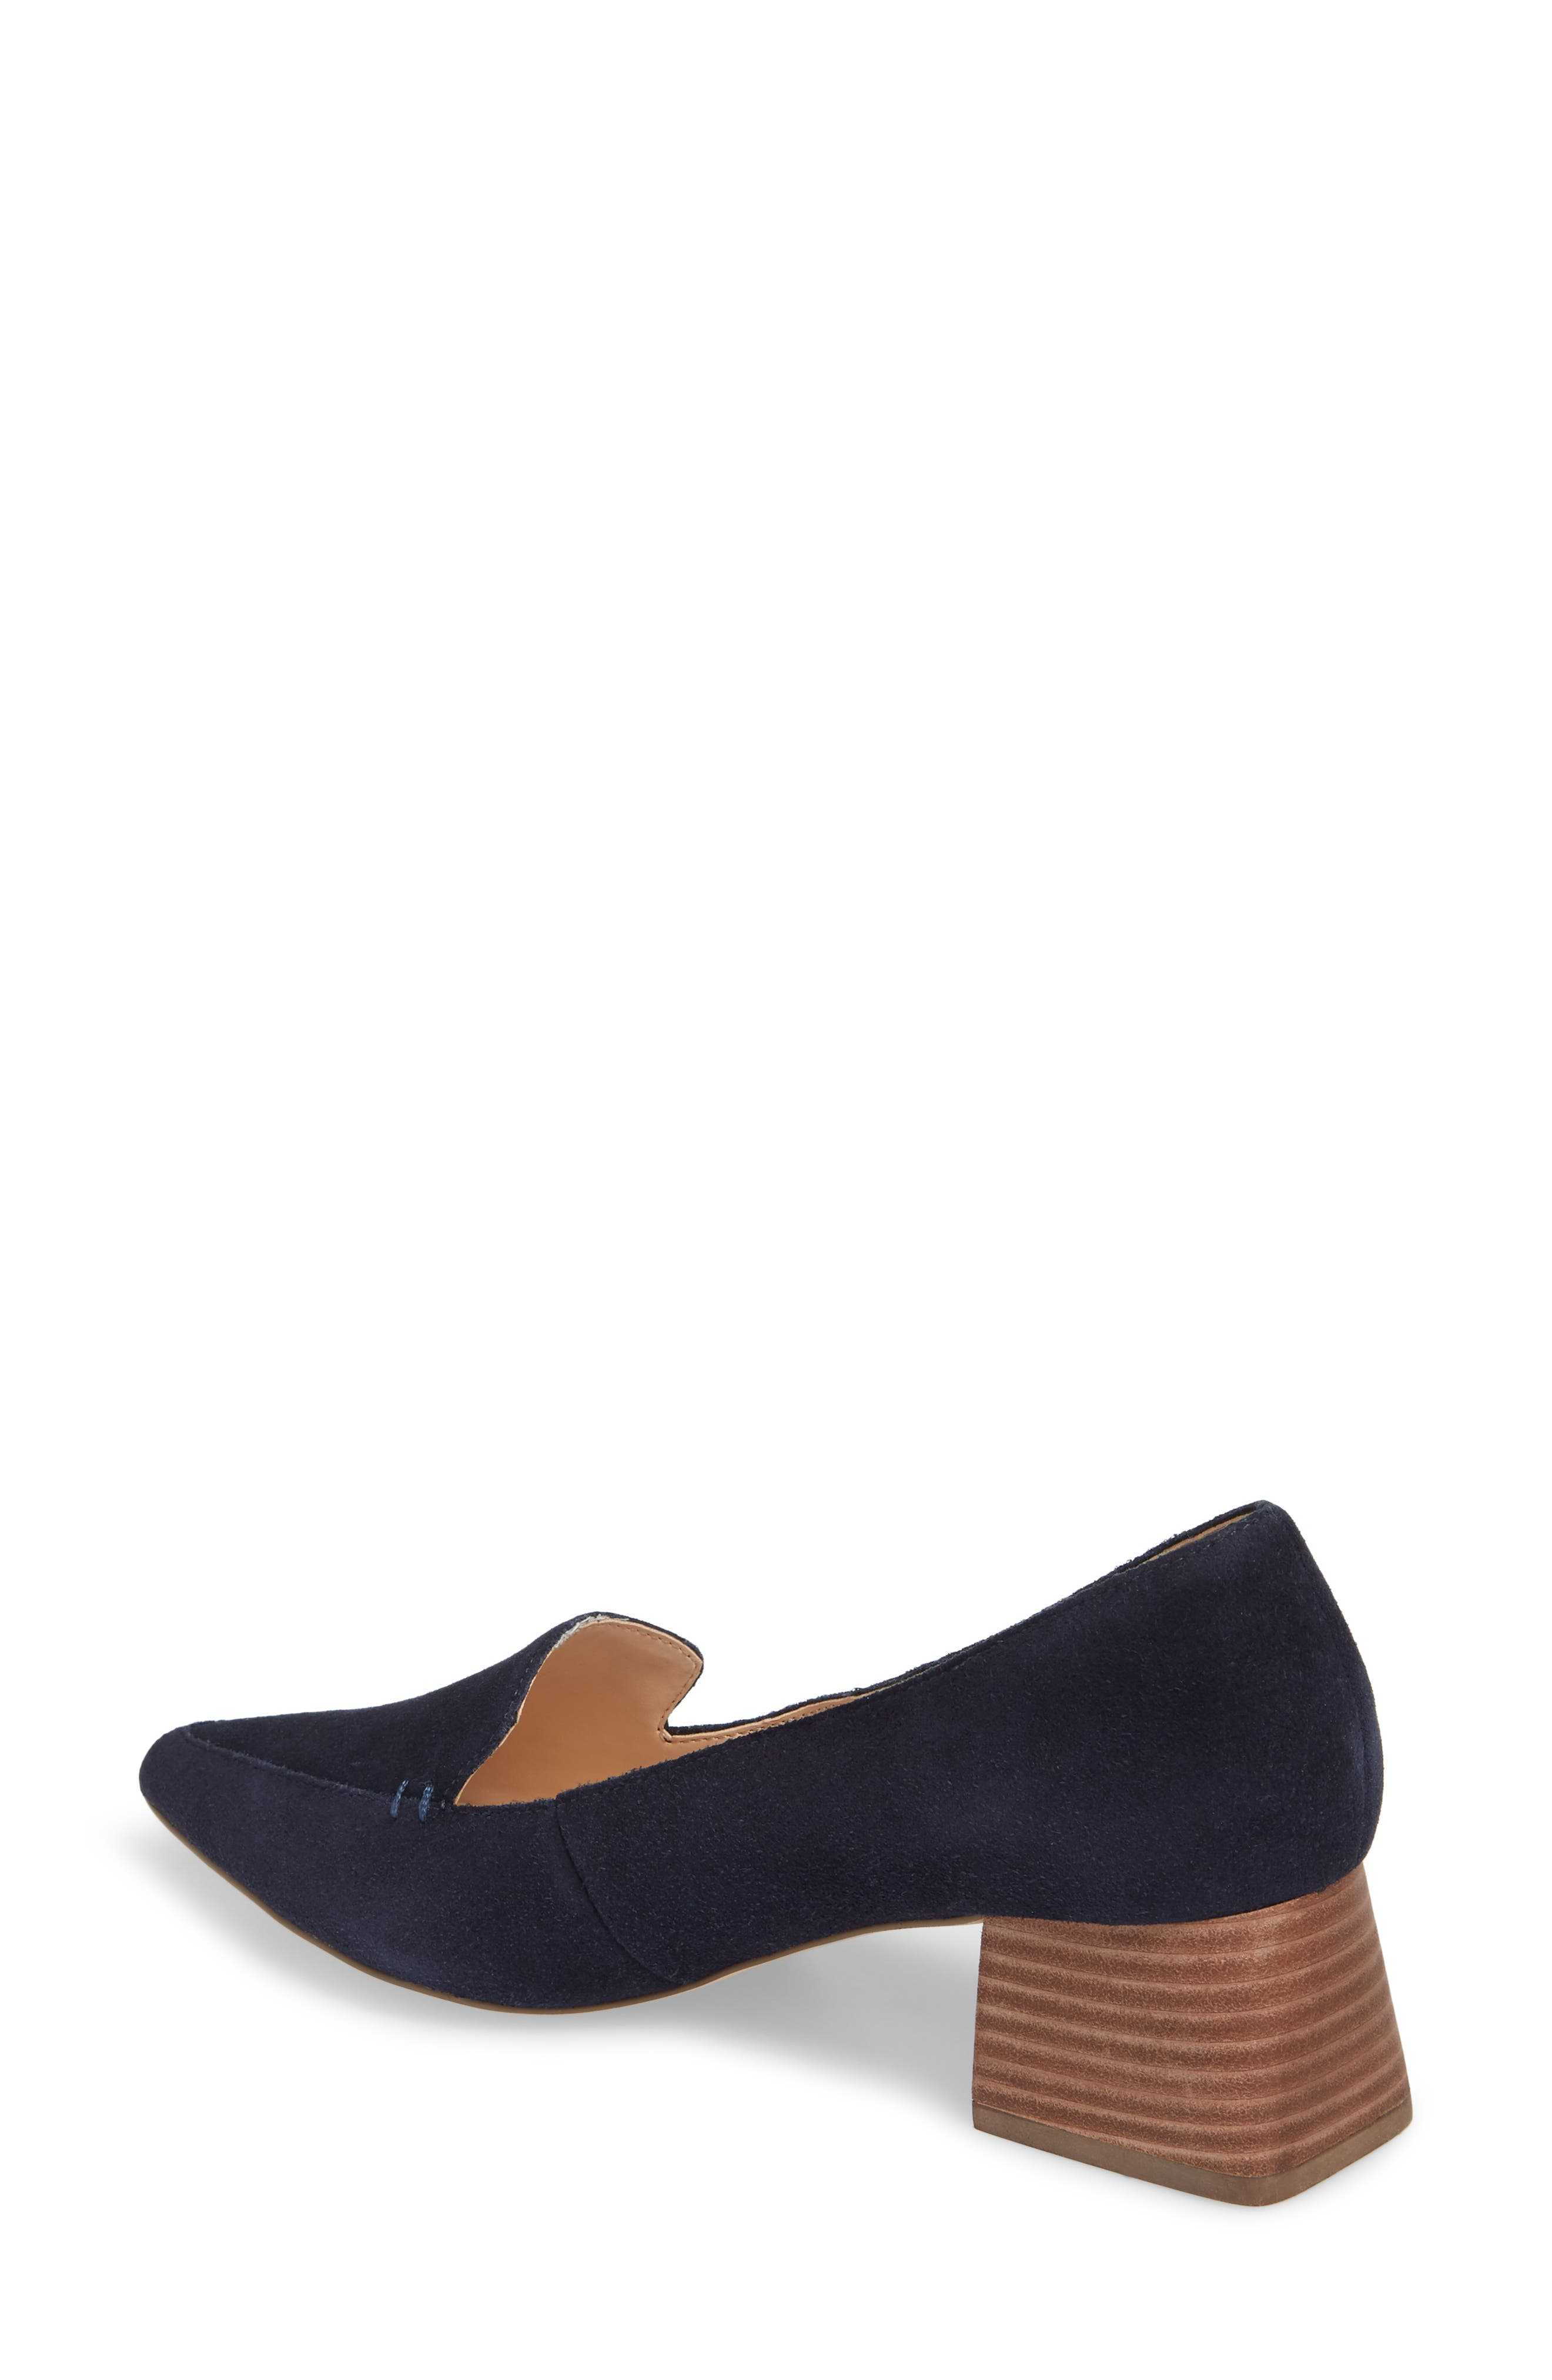 Mavis Flare Heel Loafer,                             Alternate thumbnail 2, color,                             Ombre Blue